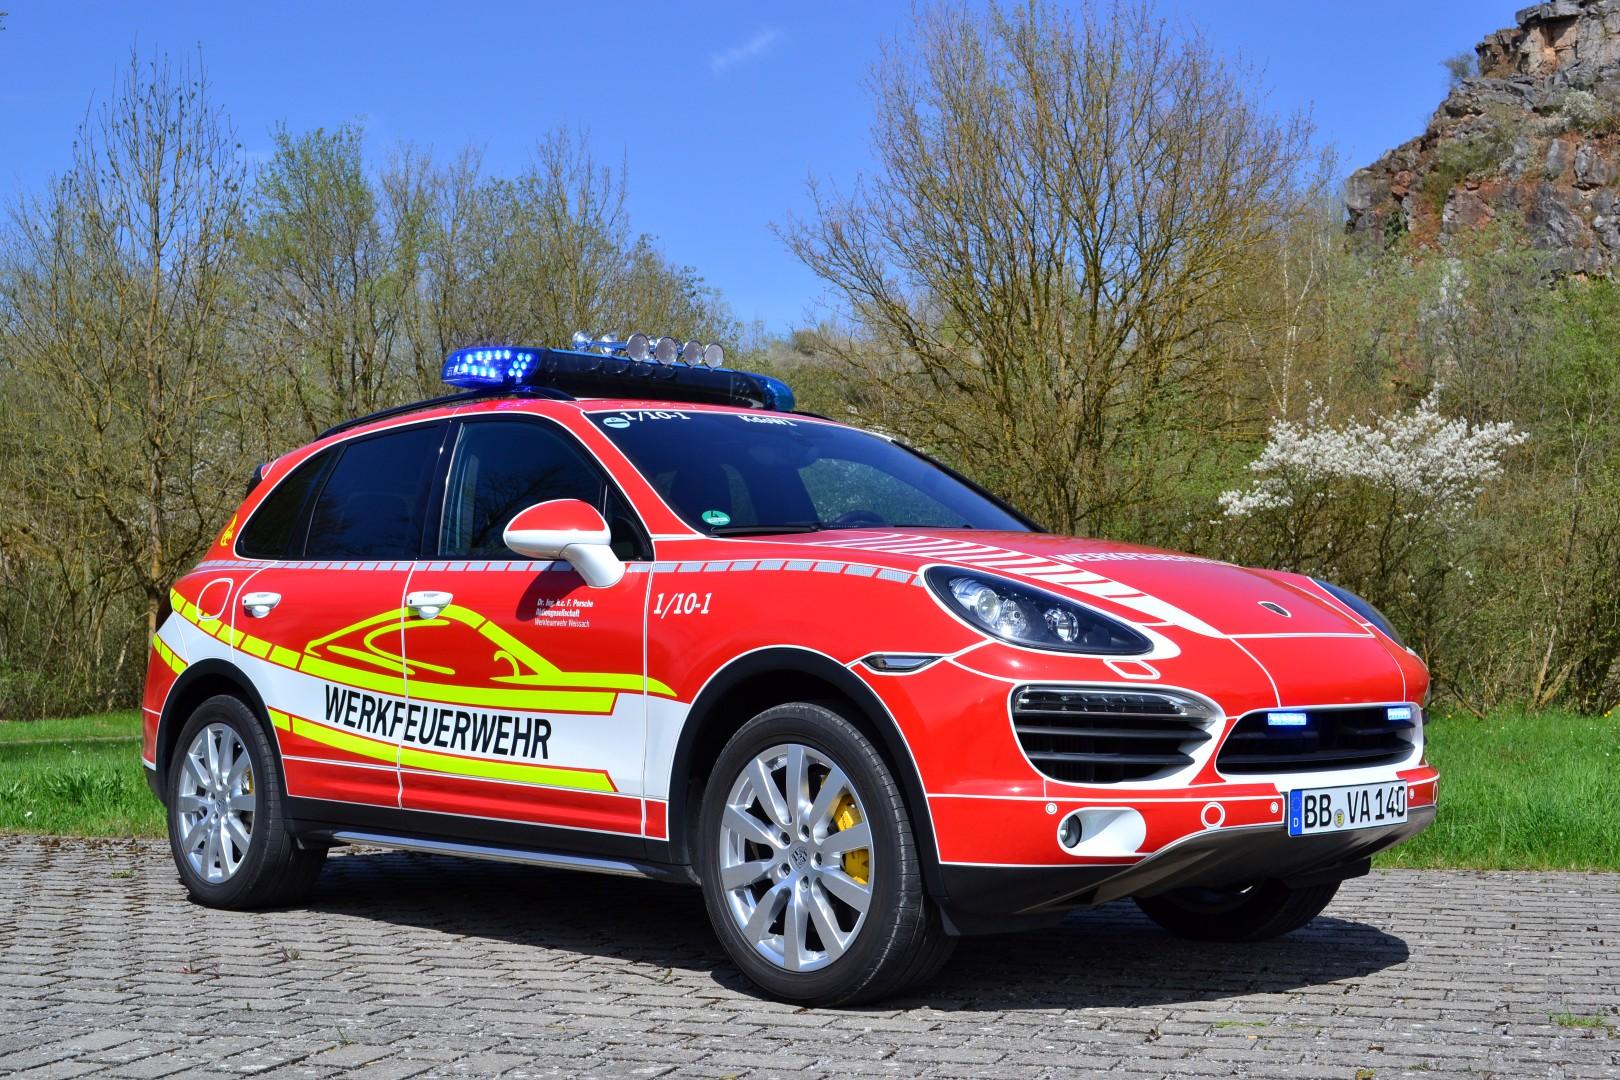 Werkfeuerwehr porsche kreisfeuerwehrverband b blingen for Porsche zentrum boblingen